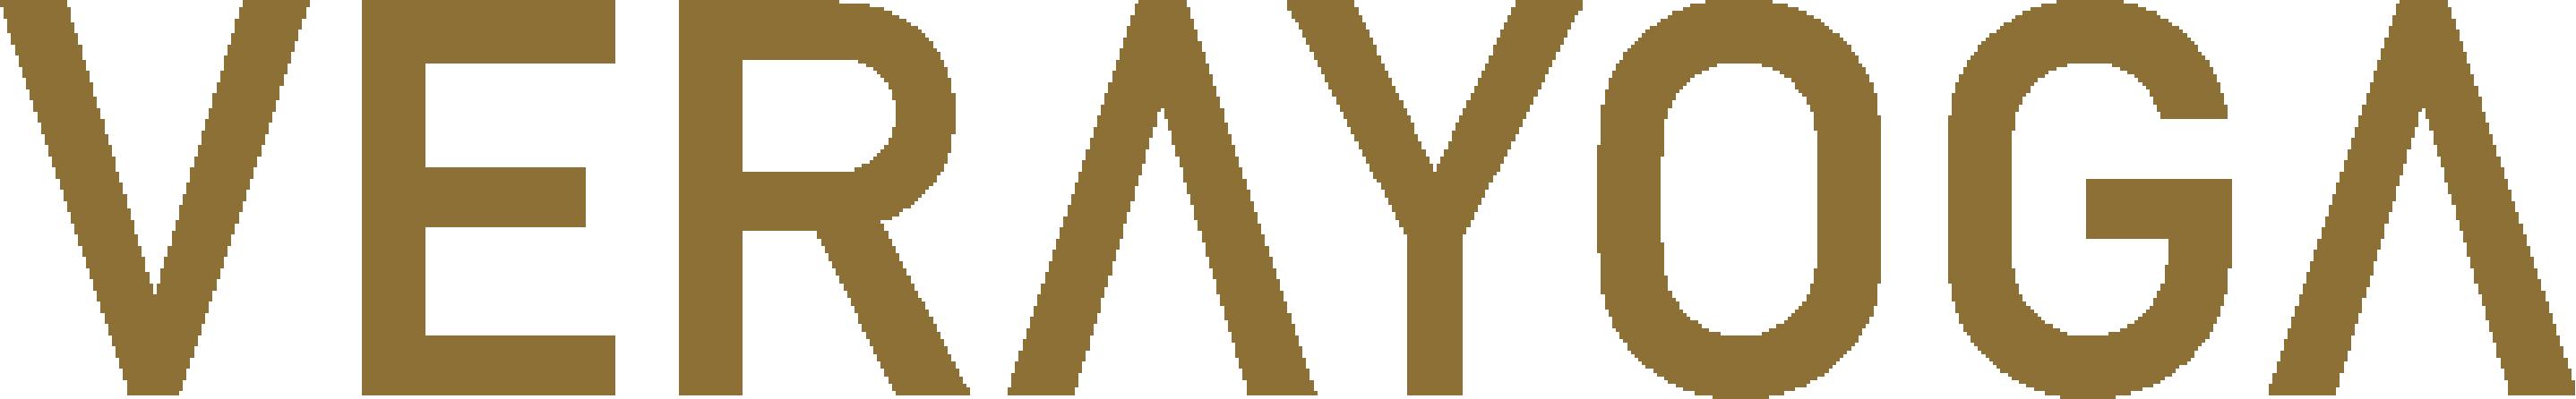 vera-yoga-gold-logo-01